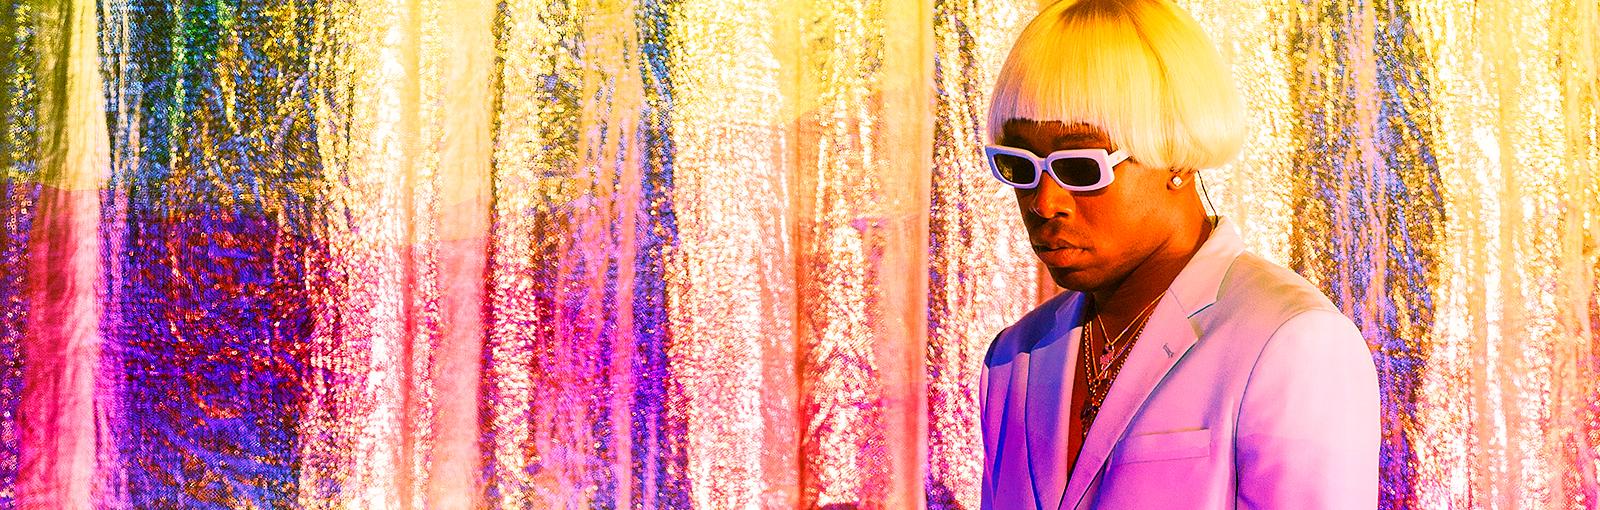 Tyler The Creator's 'Igor' Deserved An Album Of The Year Nomination, Not Best Rap Album